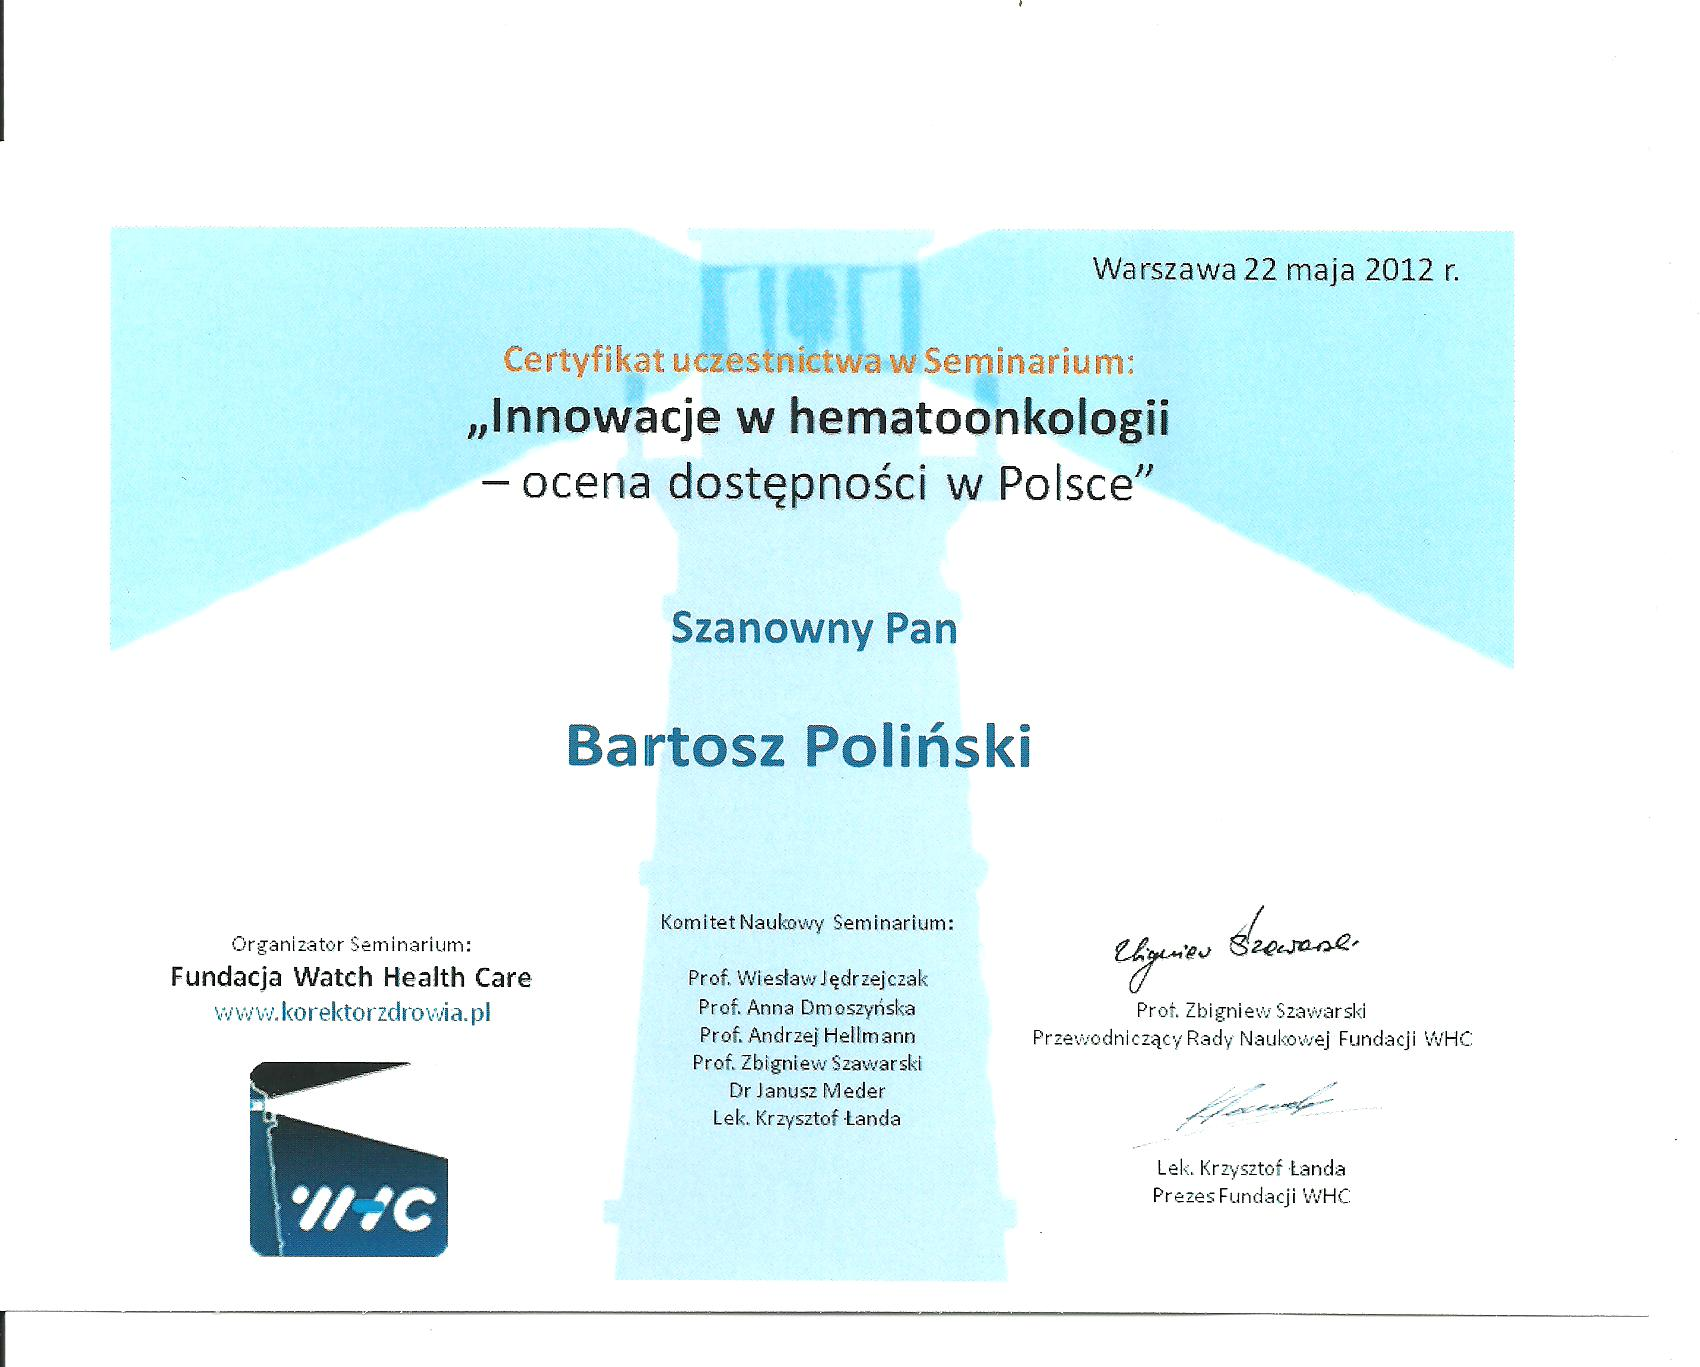 certyfikat uczestnictwa w seminarium